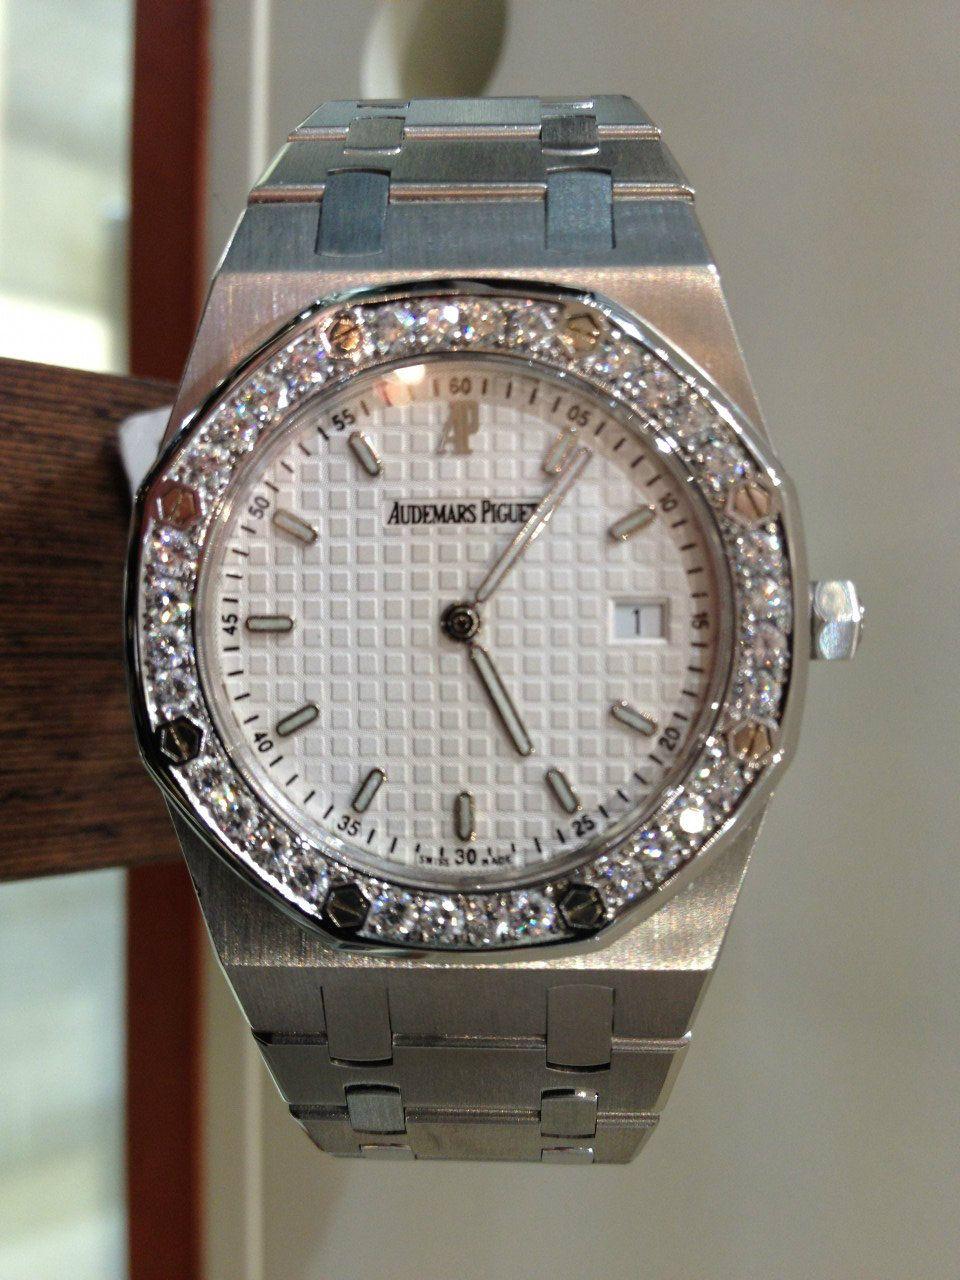 Audemars piguet royal oak quartz stainless steel diamond